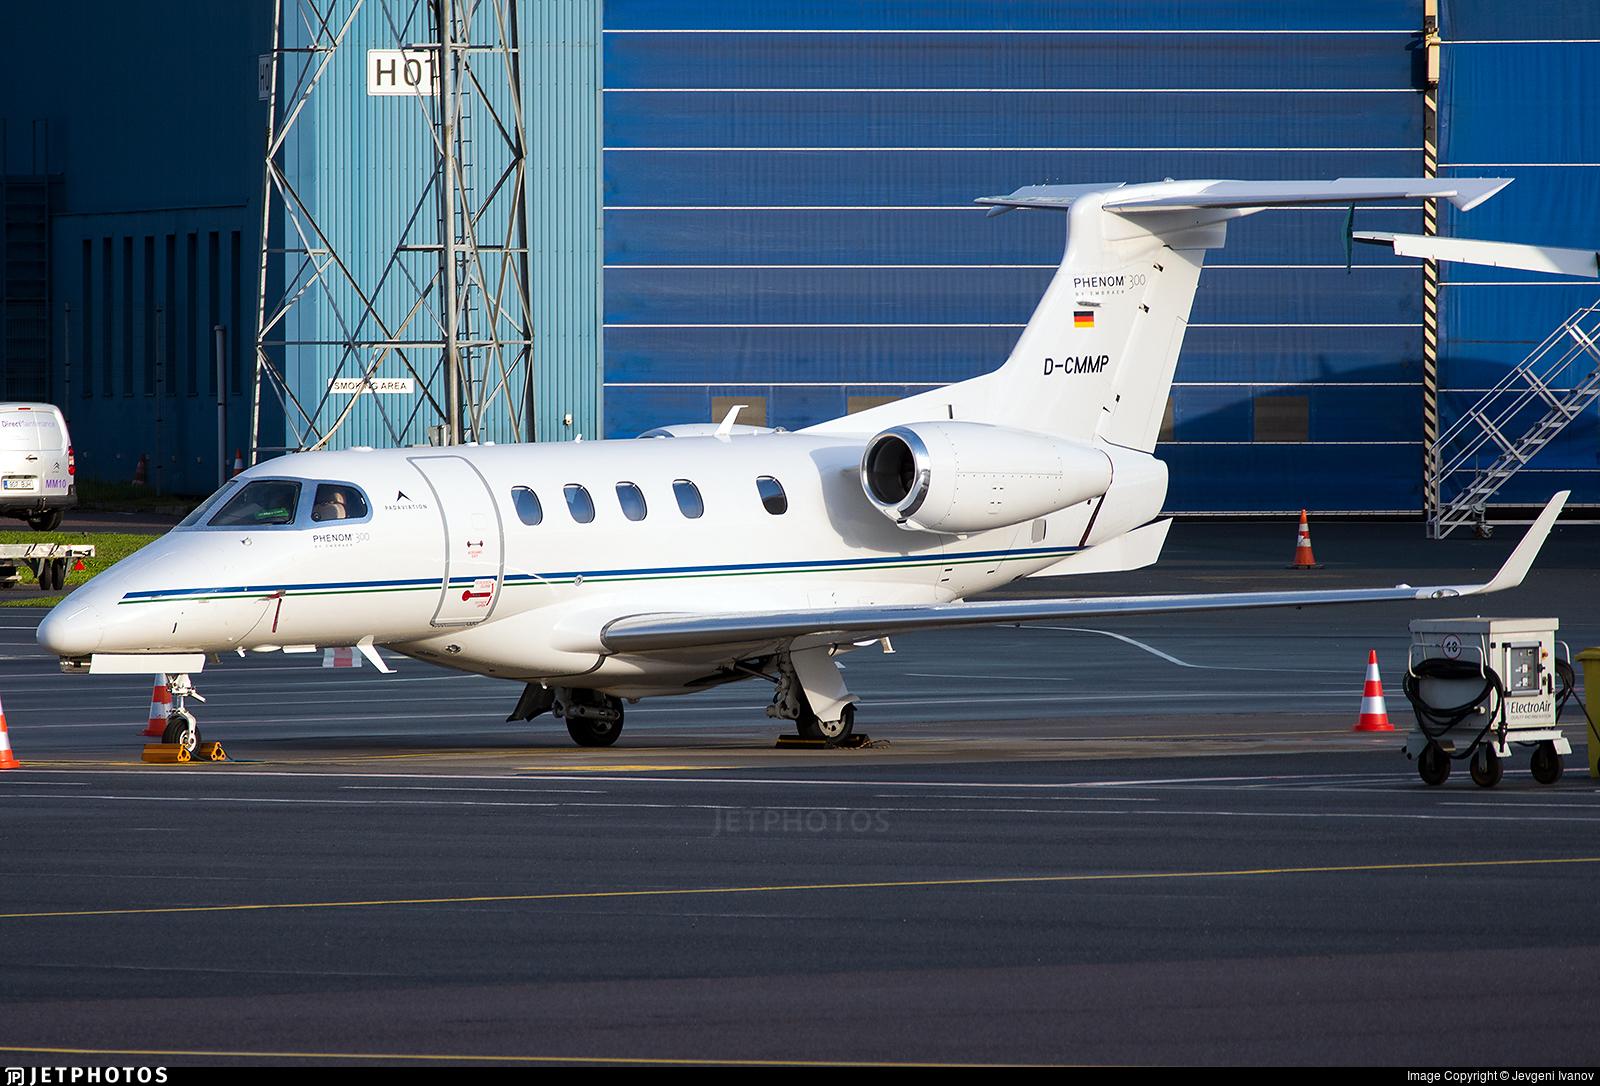 D-CMMP - Embraer 505 Phenom 300 - Padaviation